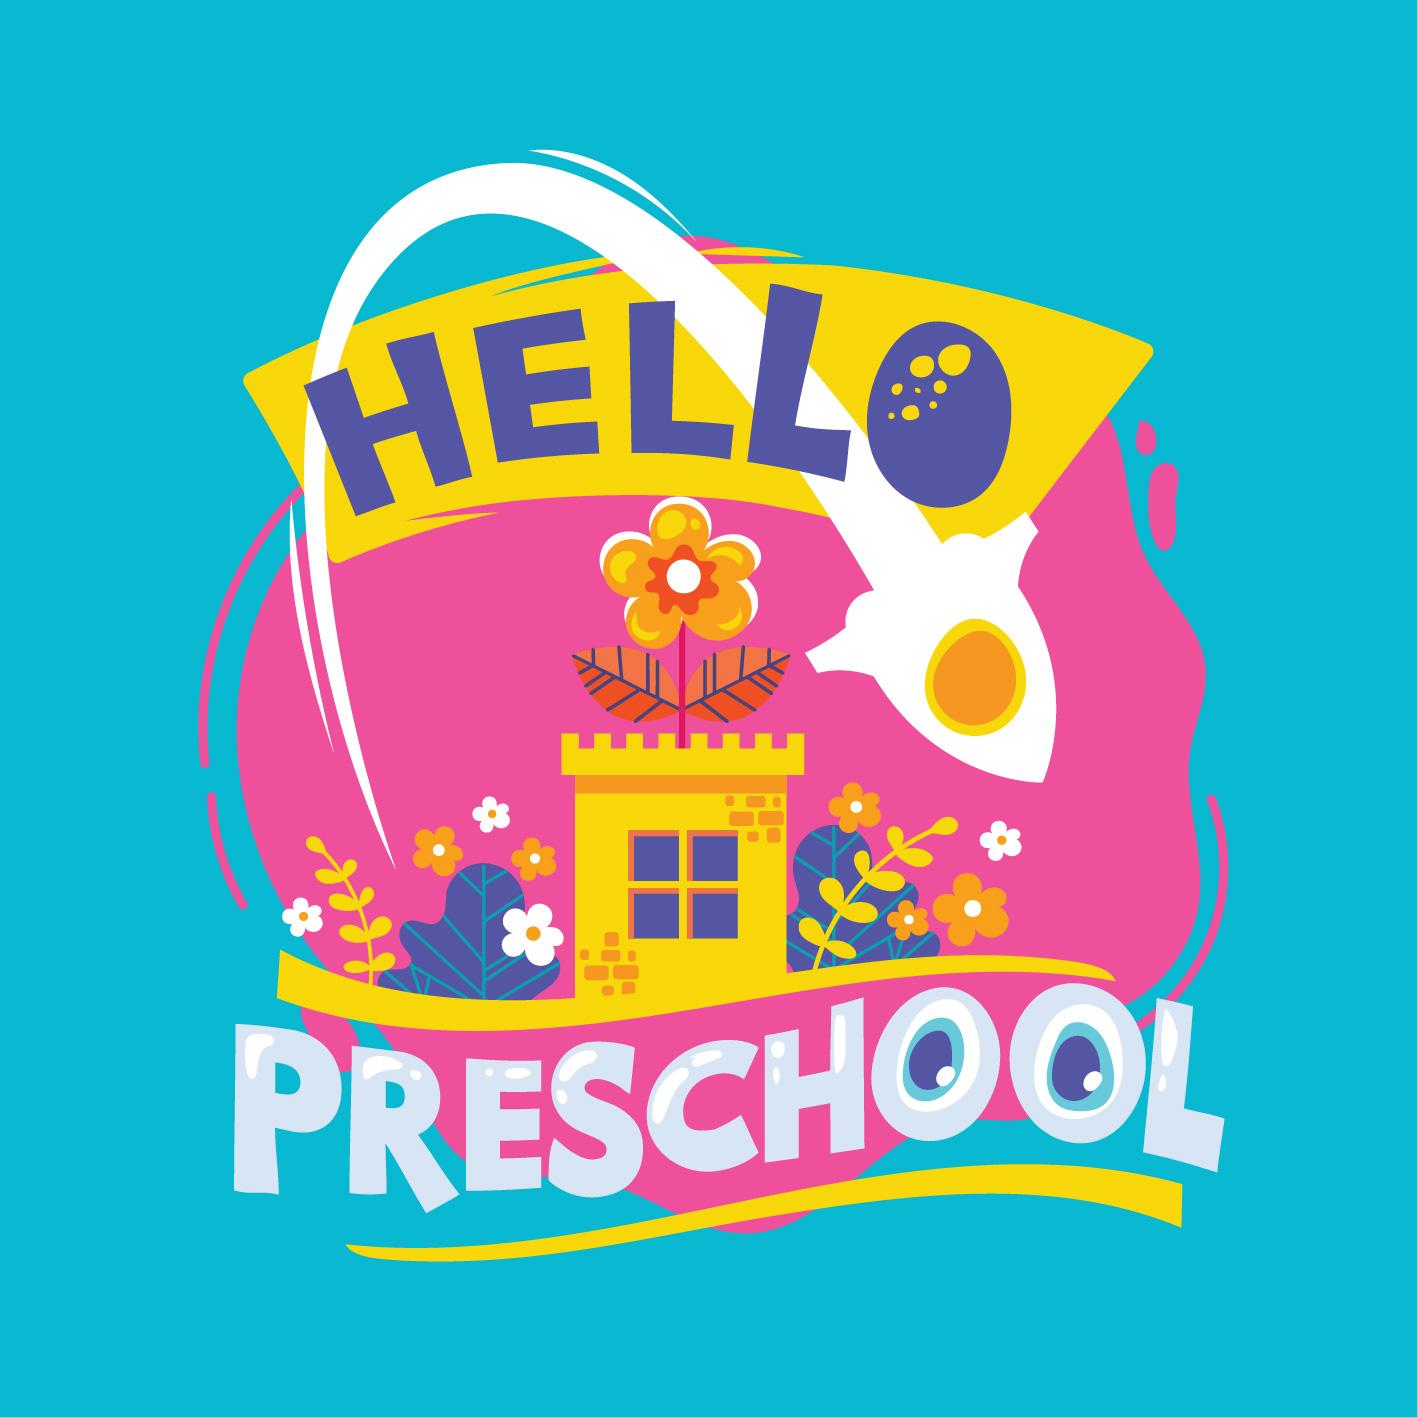 Hello Preschool Phrase Illustration Back To School Quote